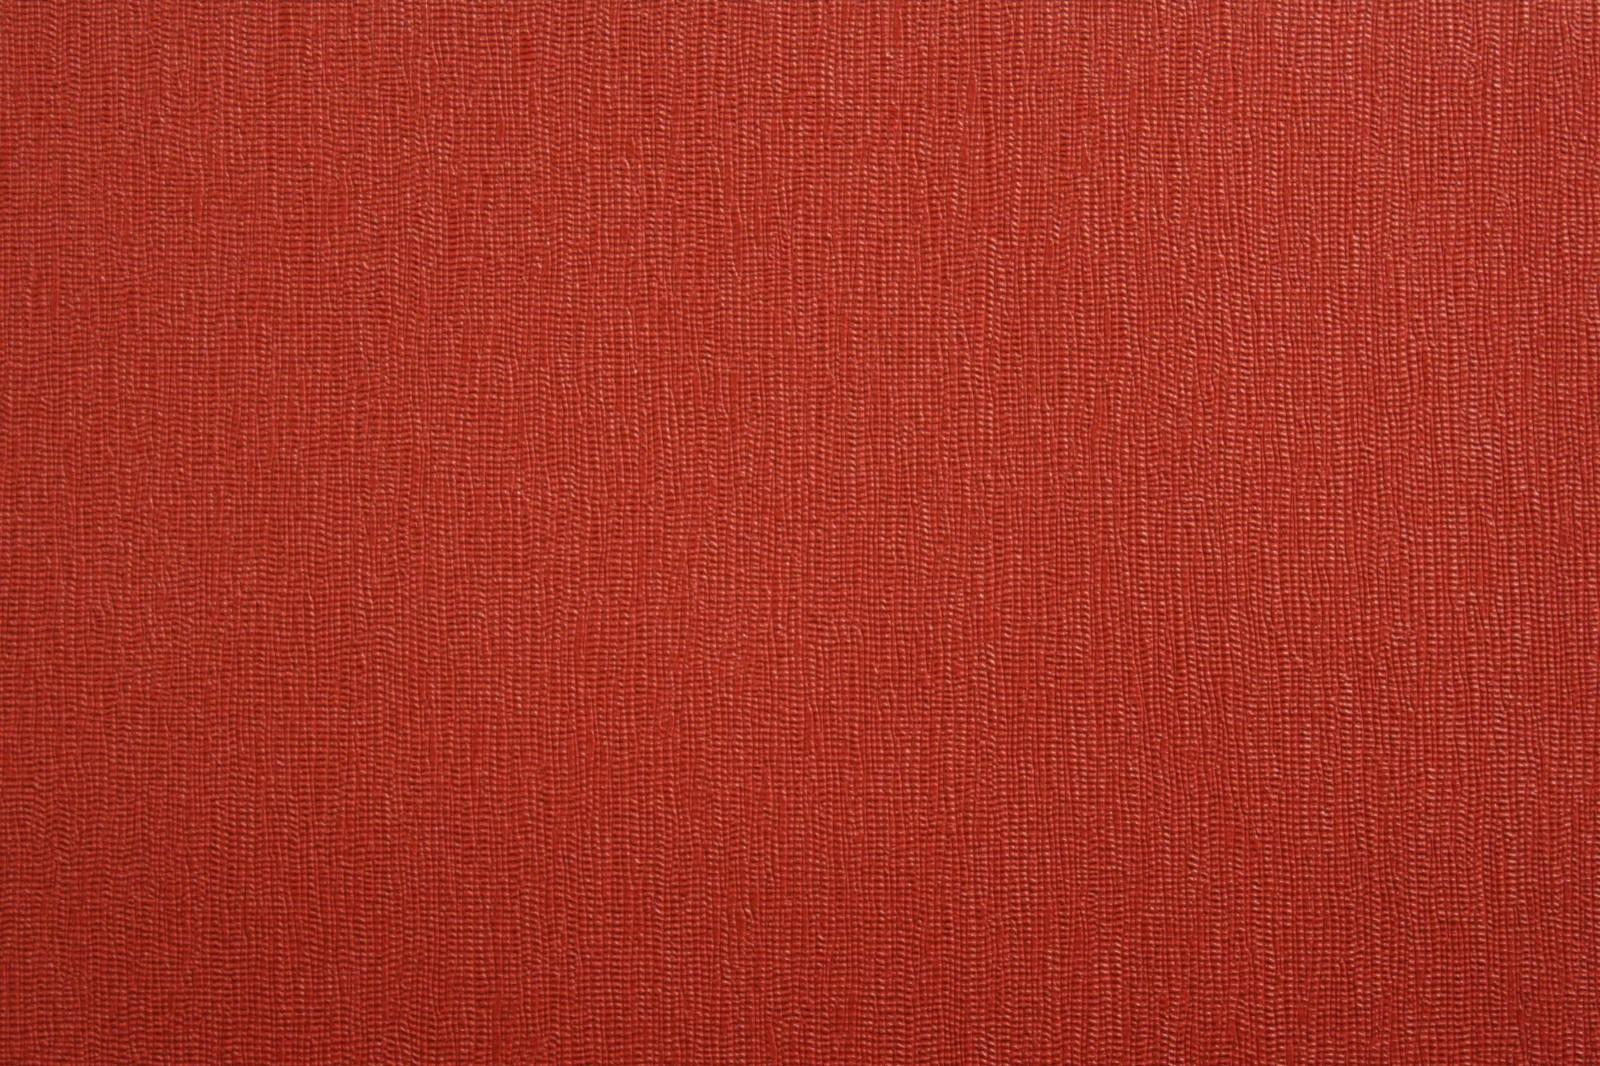 Tapete rasch seduction vliestapete 796308 unichrome red for Tapeten rasch